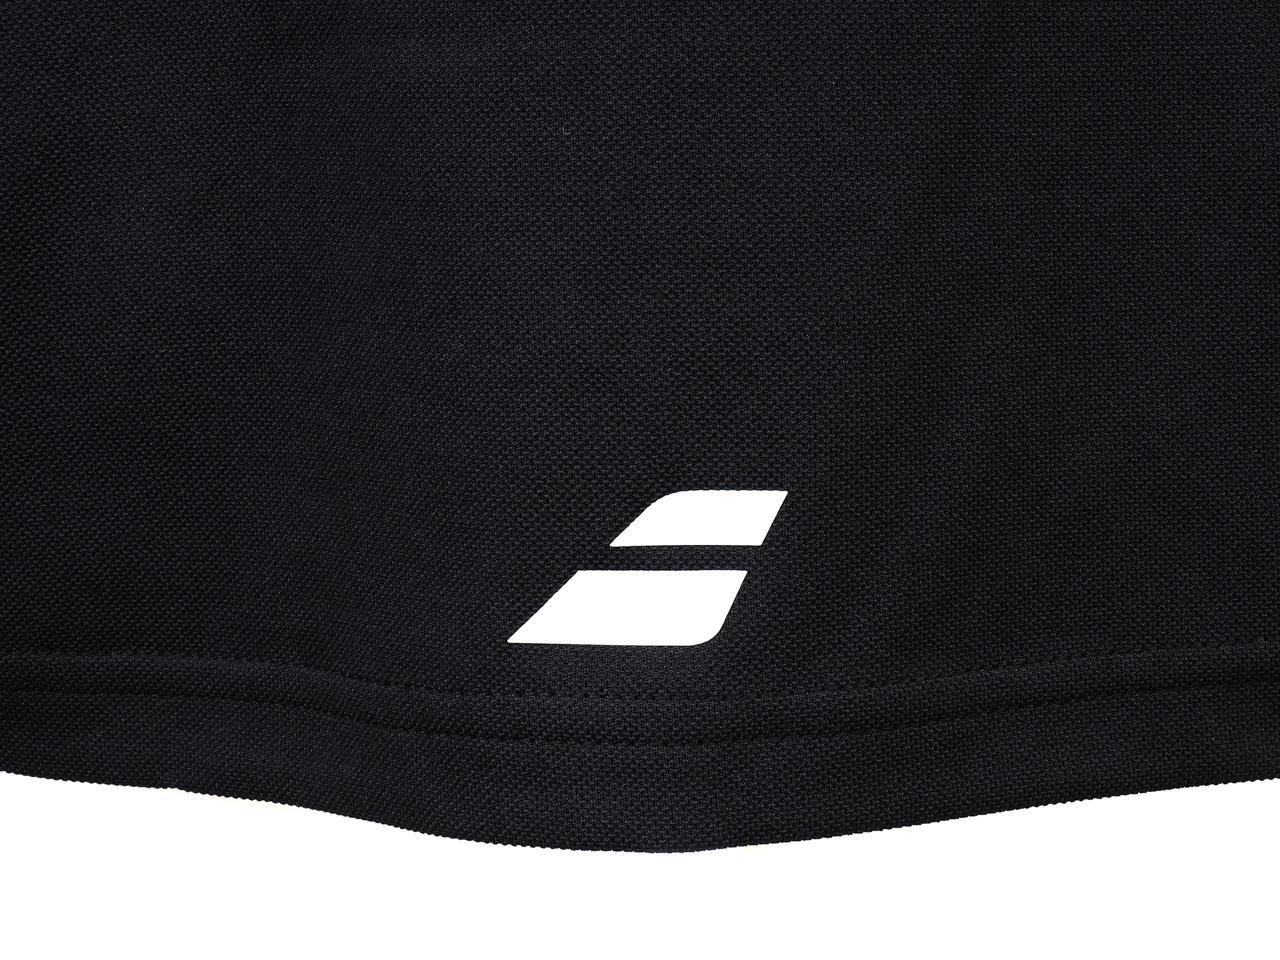 Polo-Tennis-Babolat-Polo-Core-Club-Black-Black-70103-New thumbnail 4